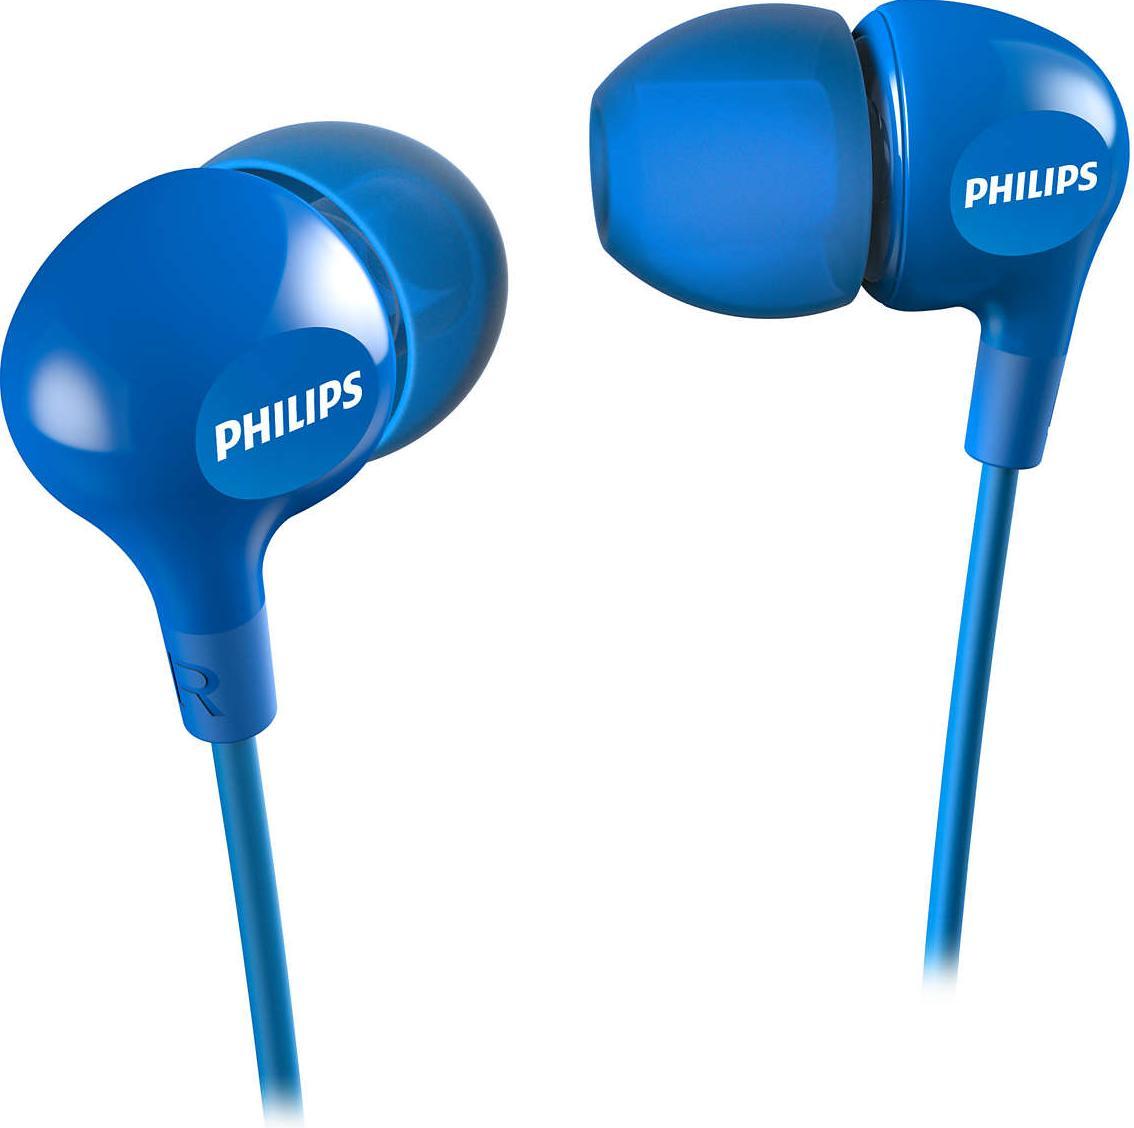 Навушники Philips SHE3550BL 00 Blue – купити в інтернет-магазині KTC ... 46e07f4993cd9